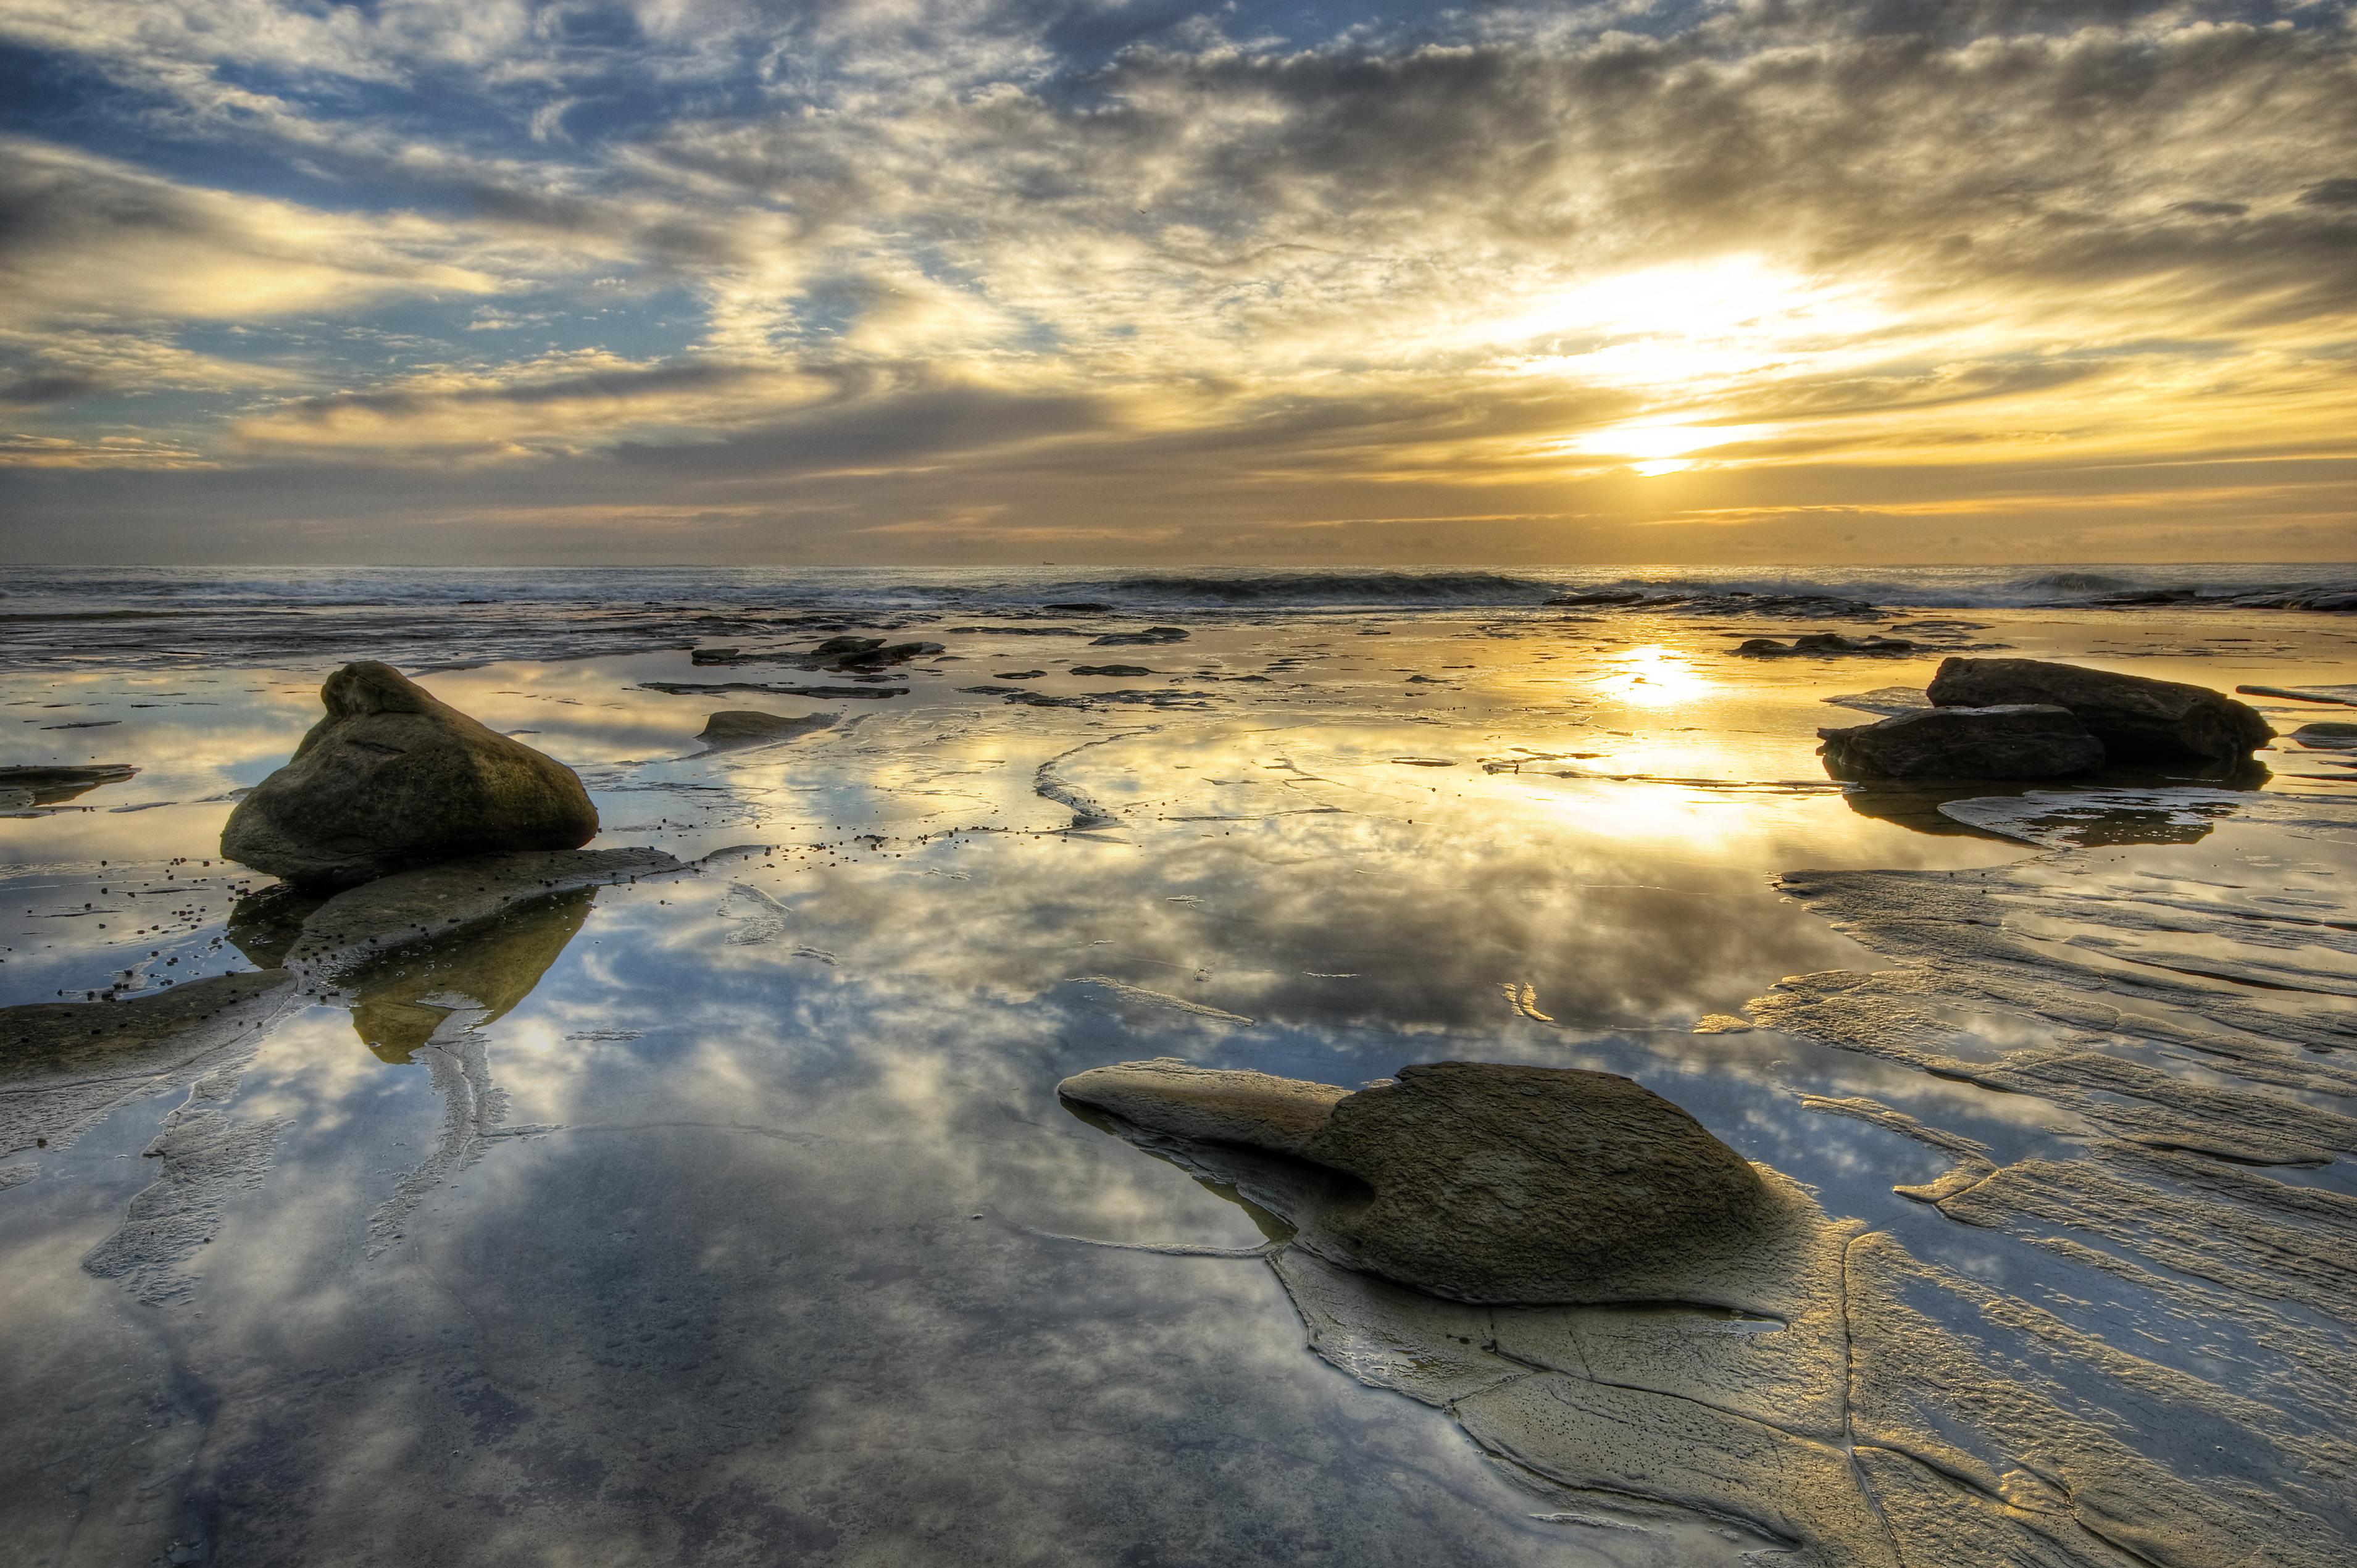 закат камень берег море sunset stone shore sea  № 1023649 без смс